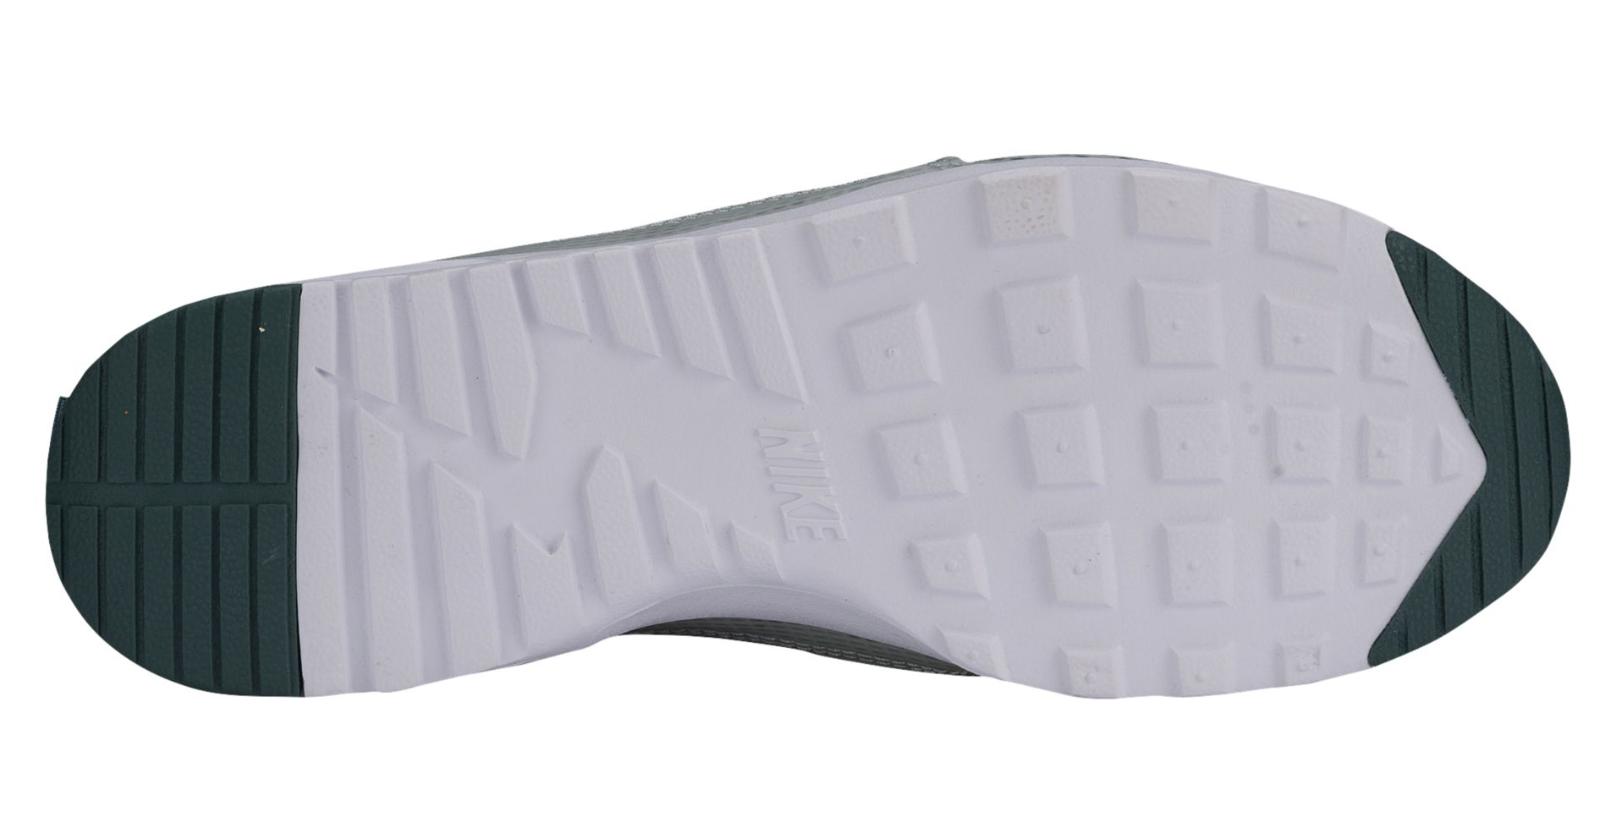 Neuer Frauen Nike Größe: Air Max Thea Schuh Größe: Nike 5 Farben: Hell Silber 069394